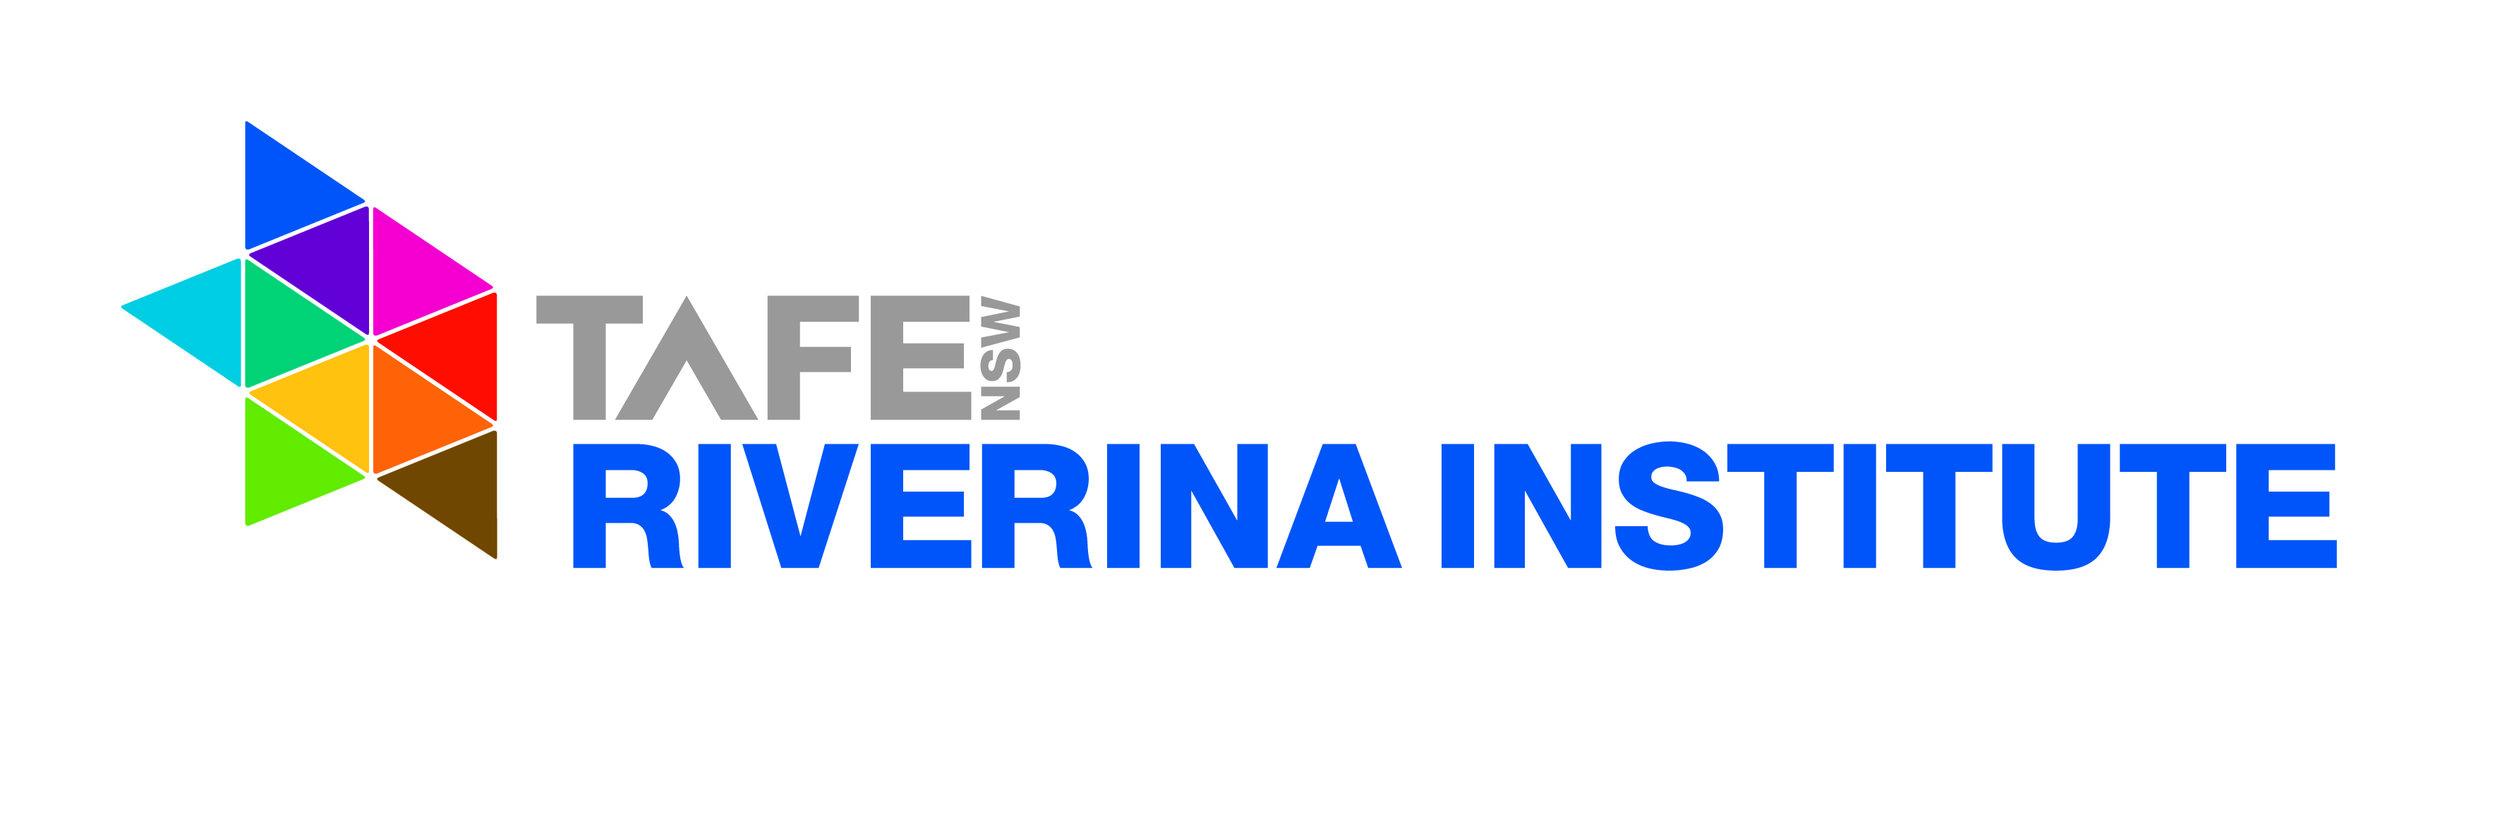 Riverina Inst Logo.jpg